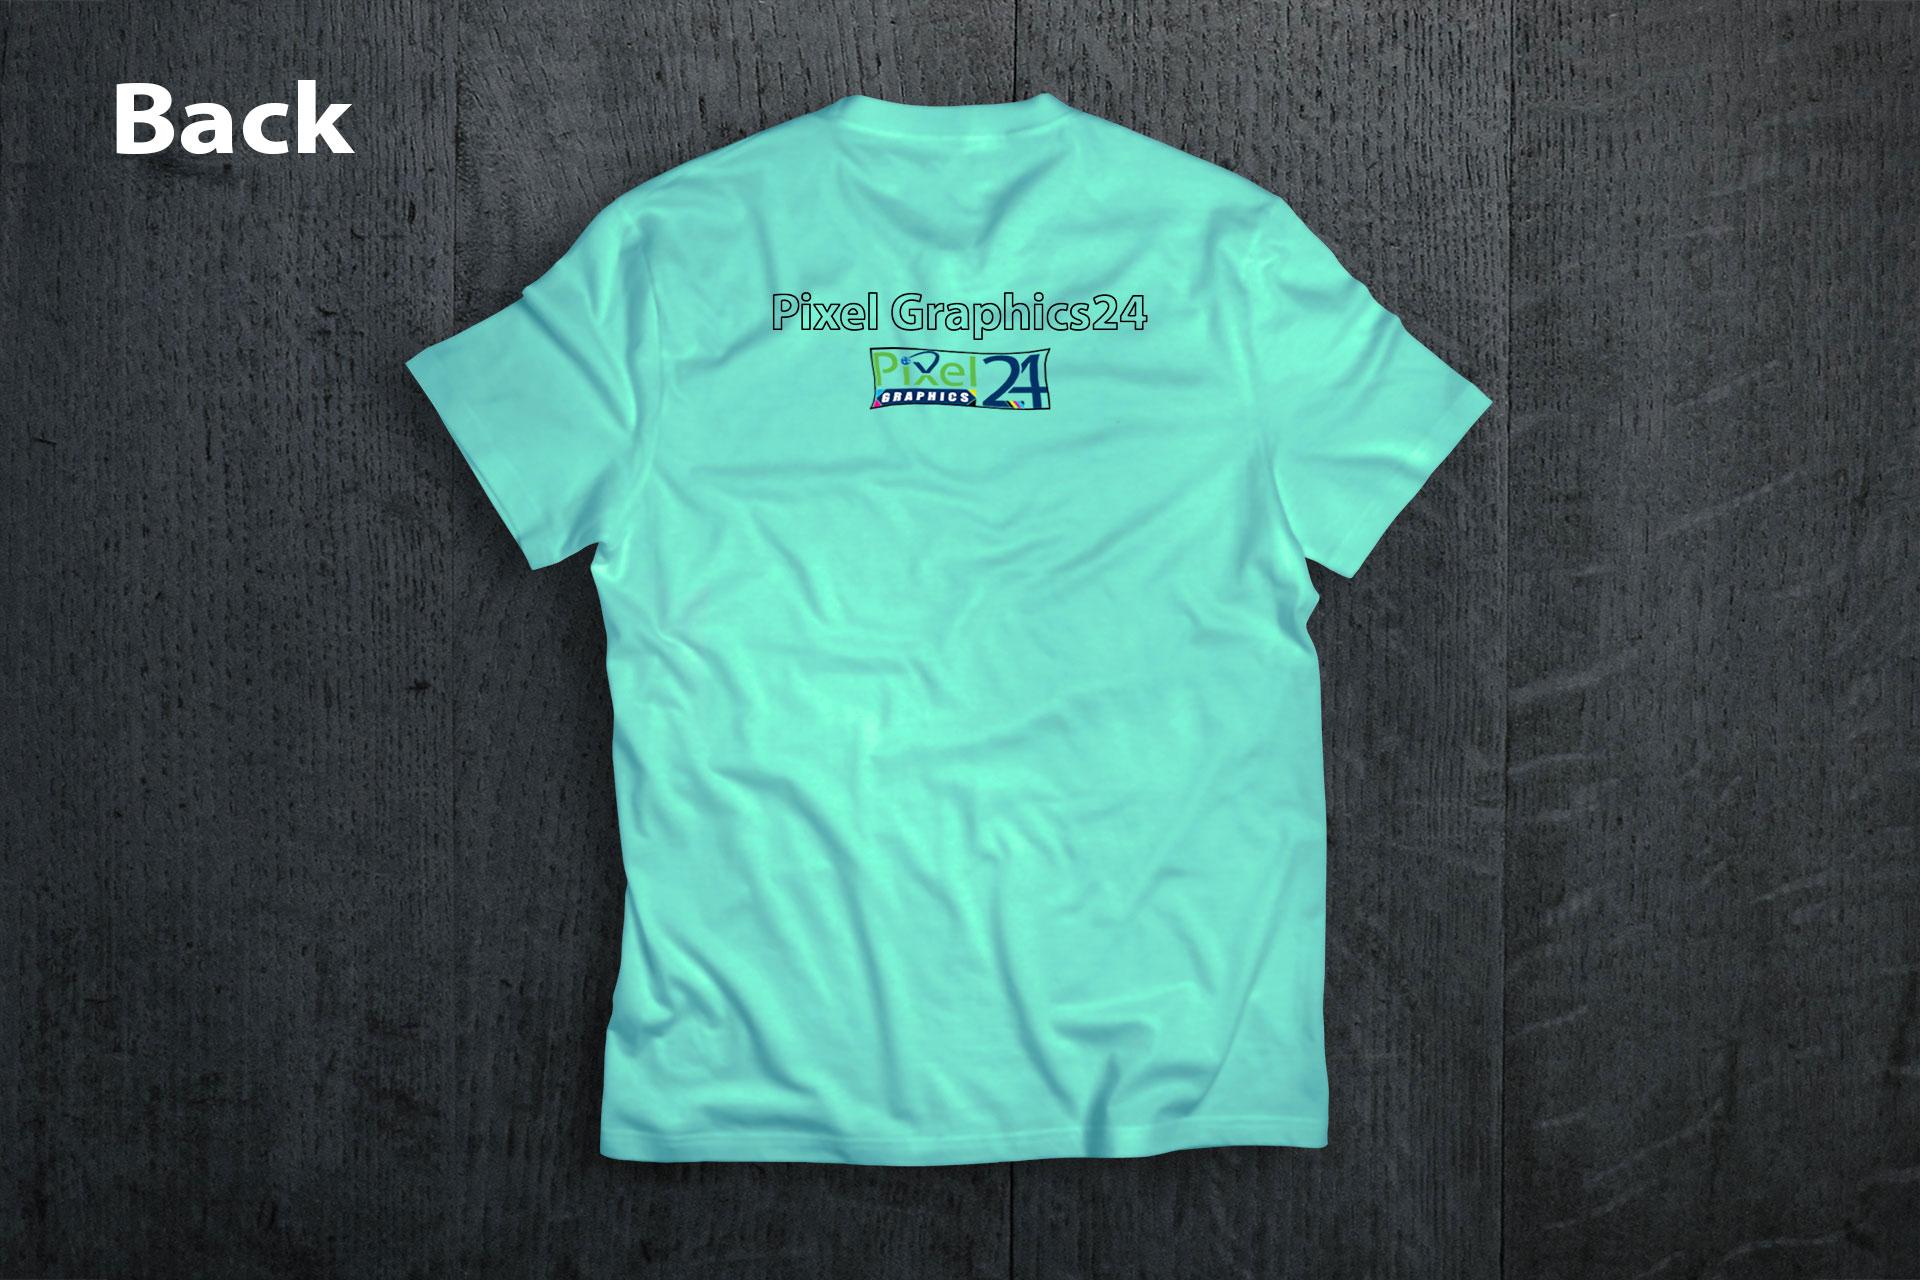 T-Shirt Design Merchandise    Clipping Path Services    Photo Editing Services    Image Editing Services